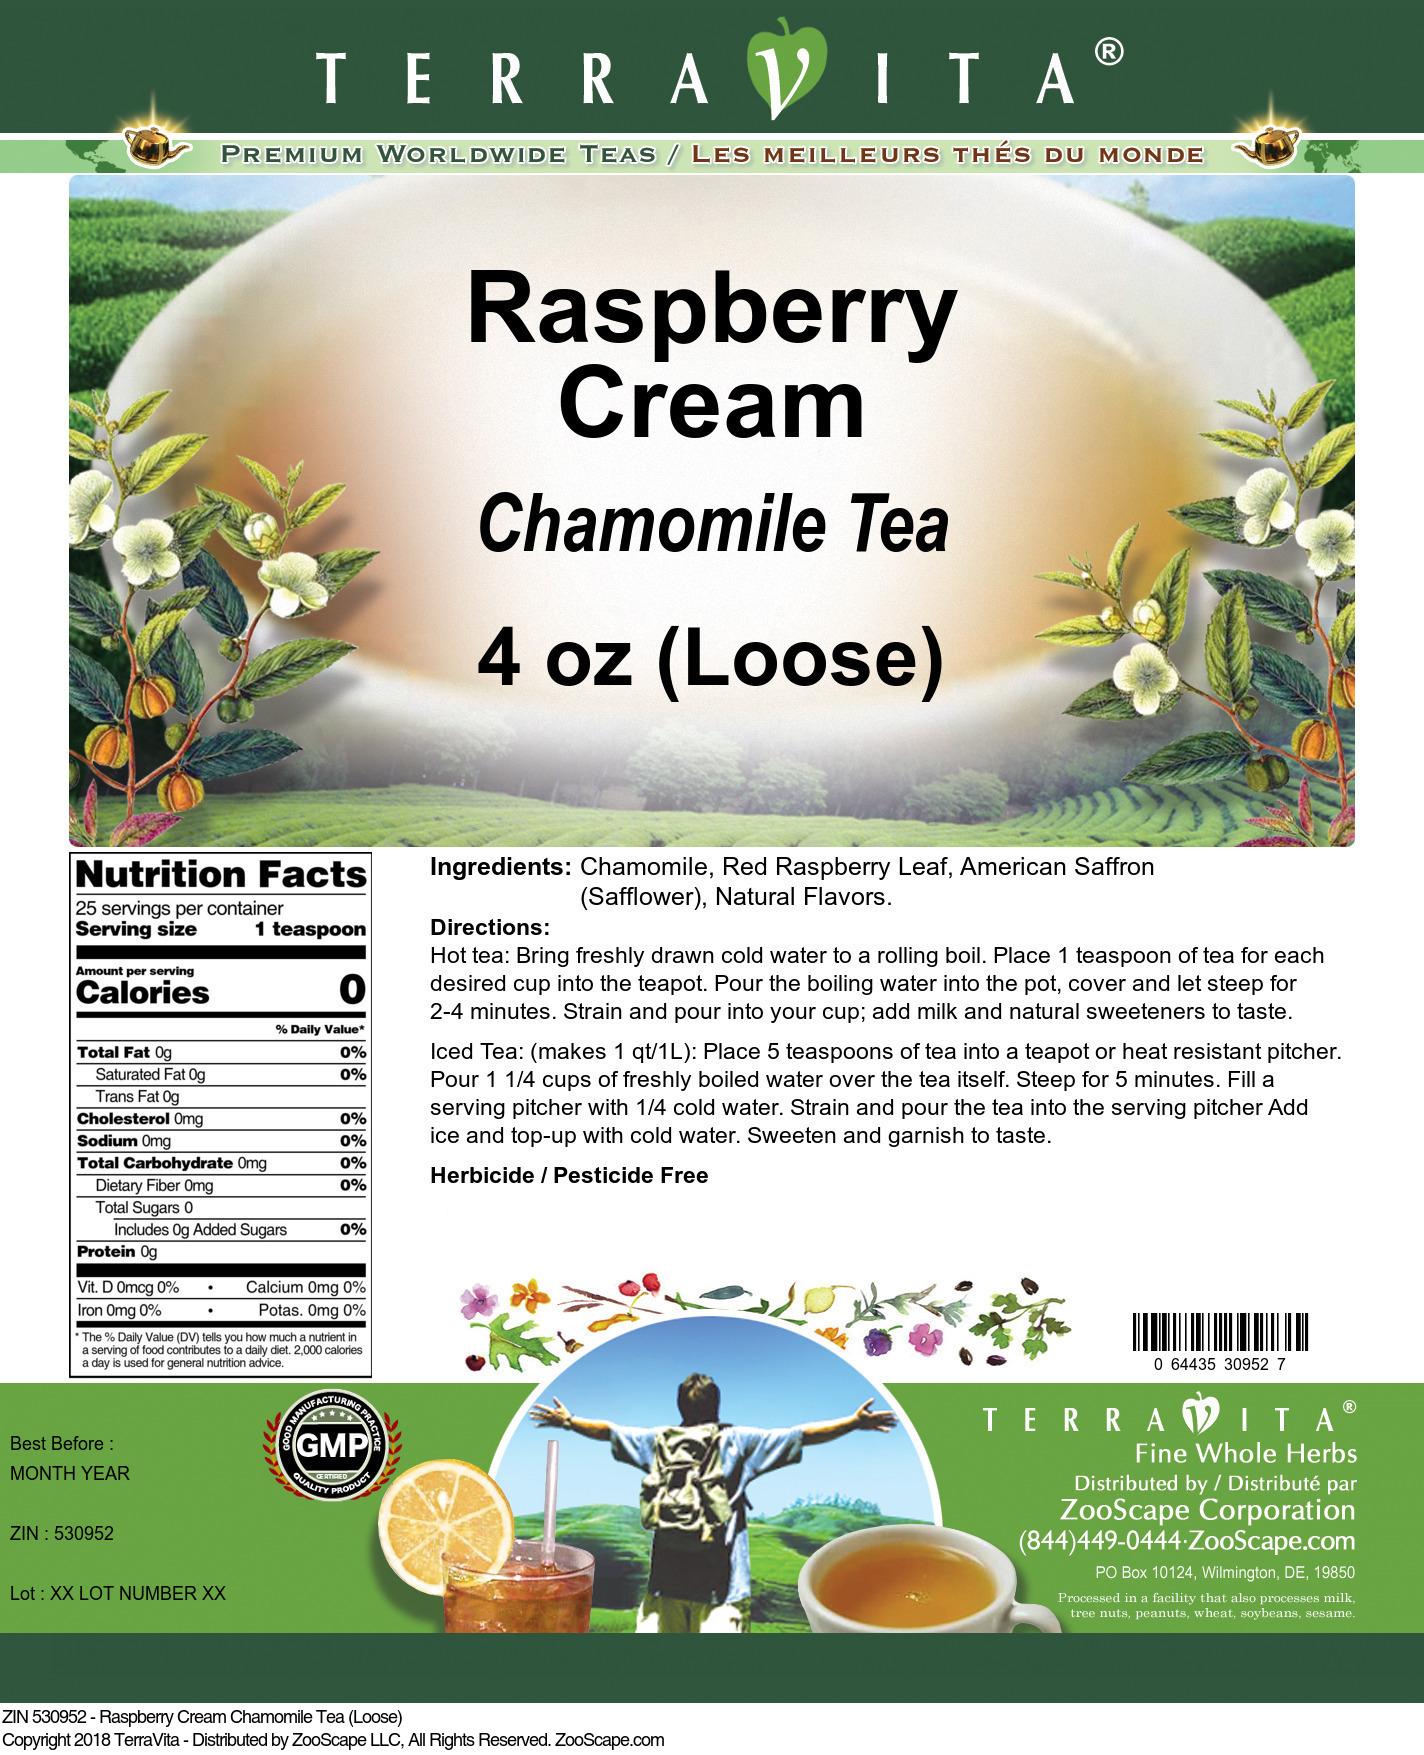 Raspberry Cream Chamomile Tea